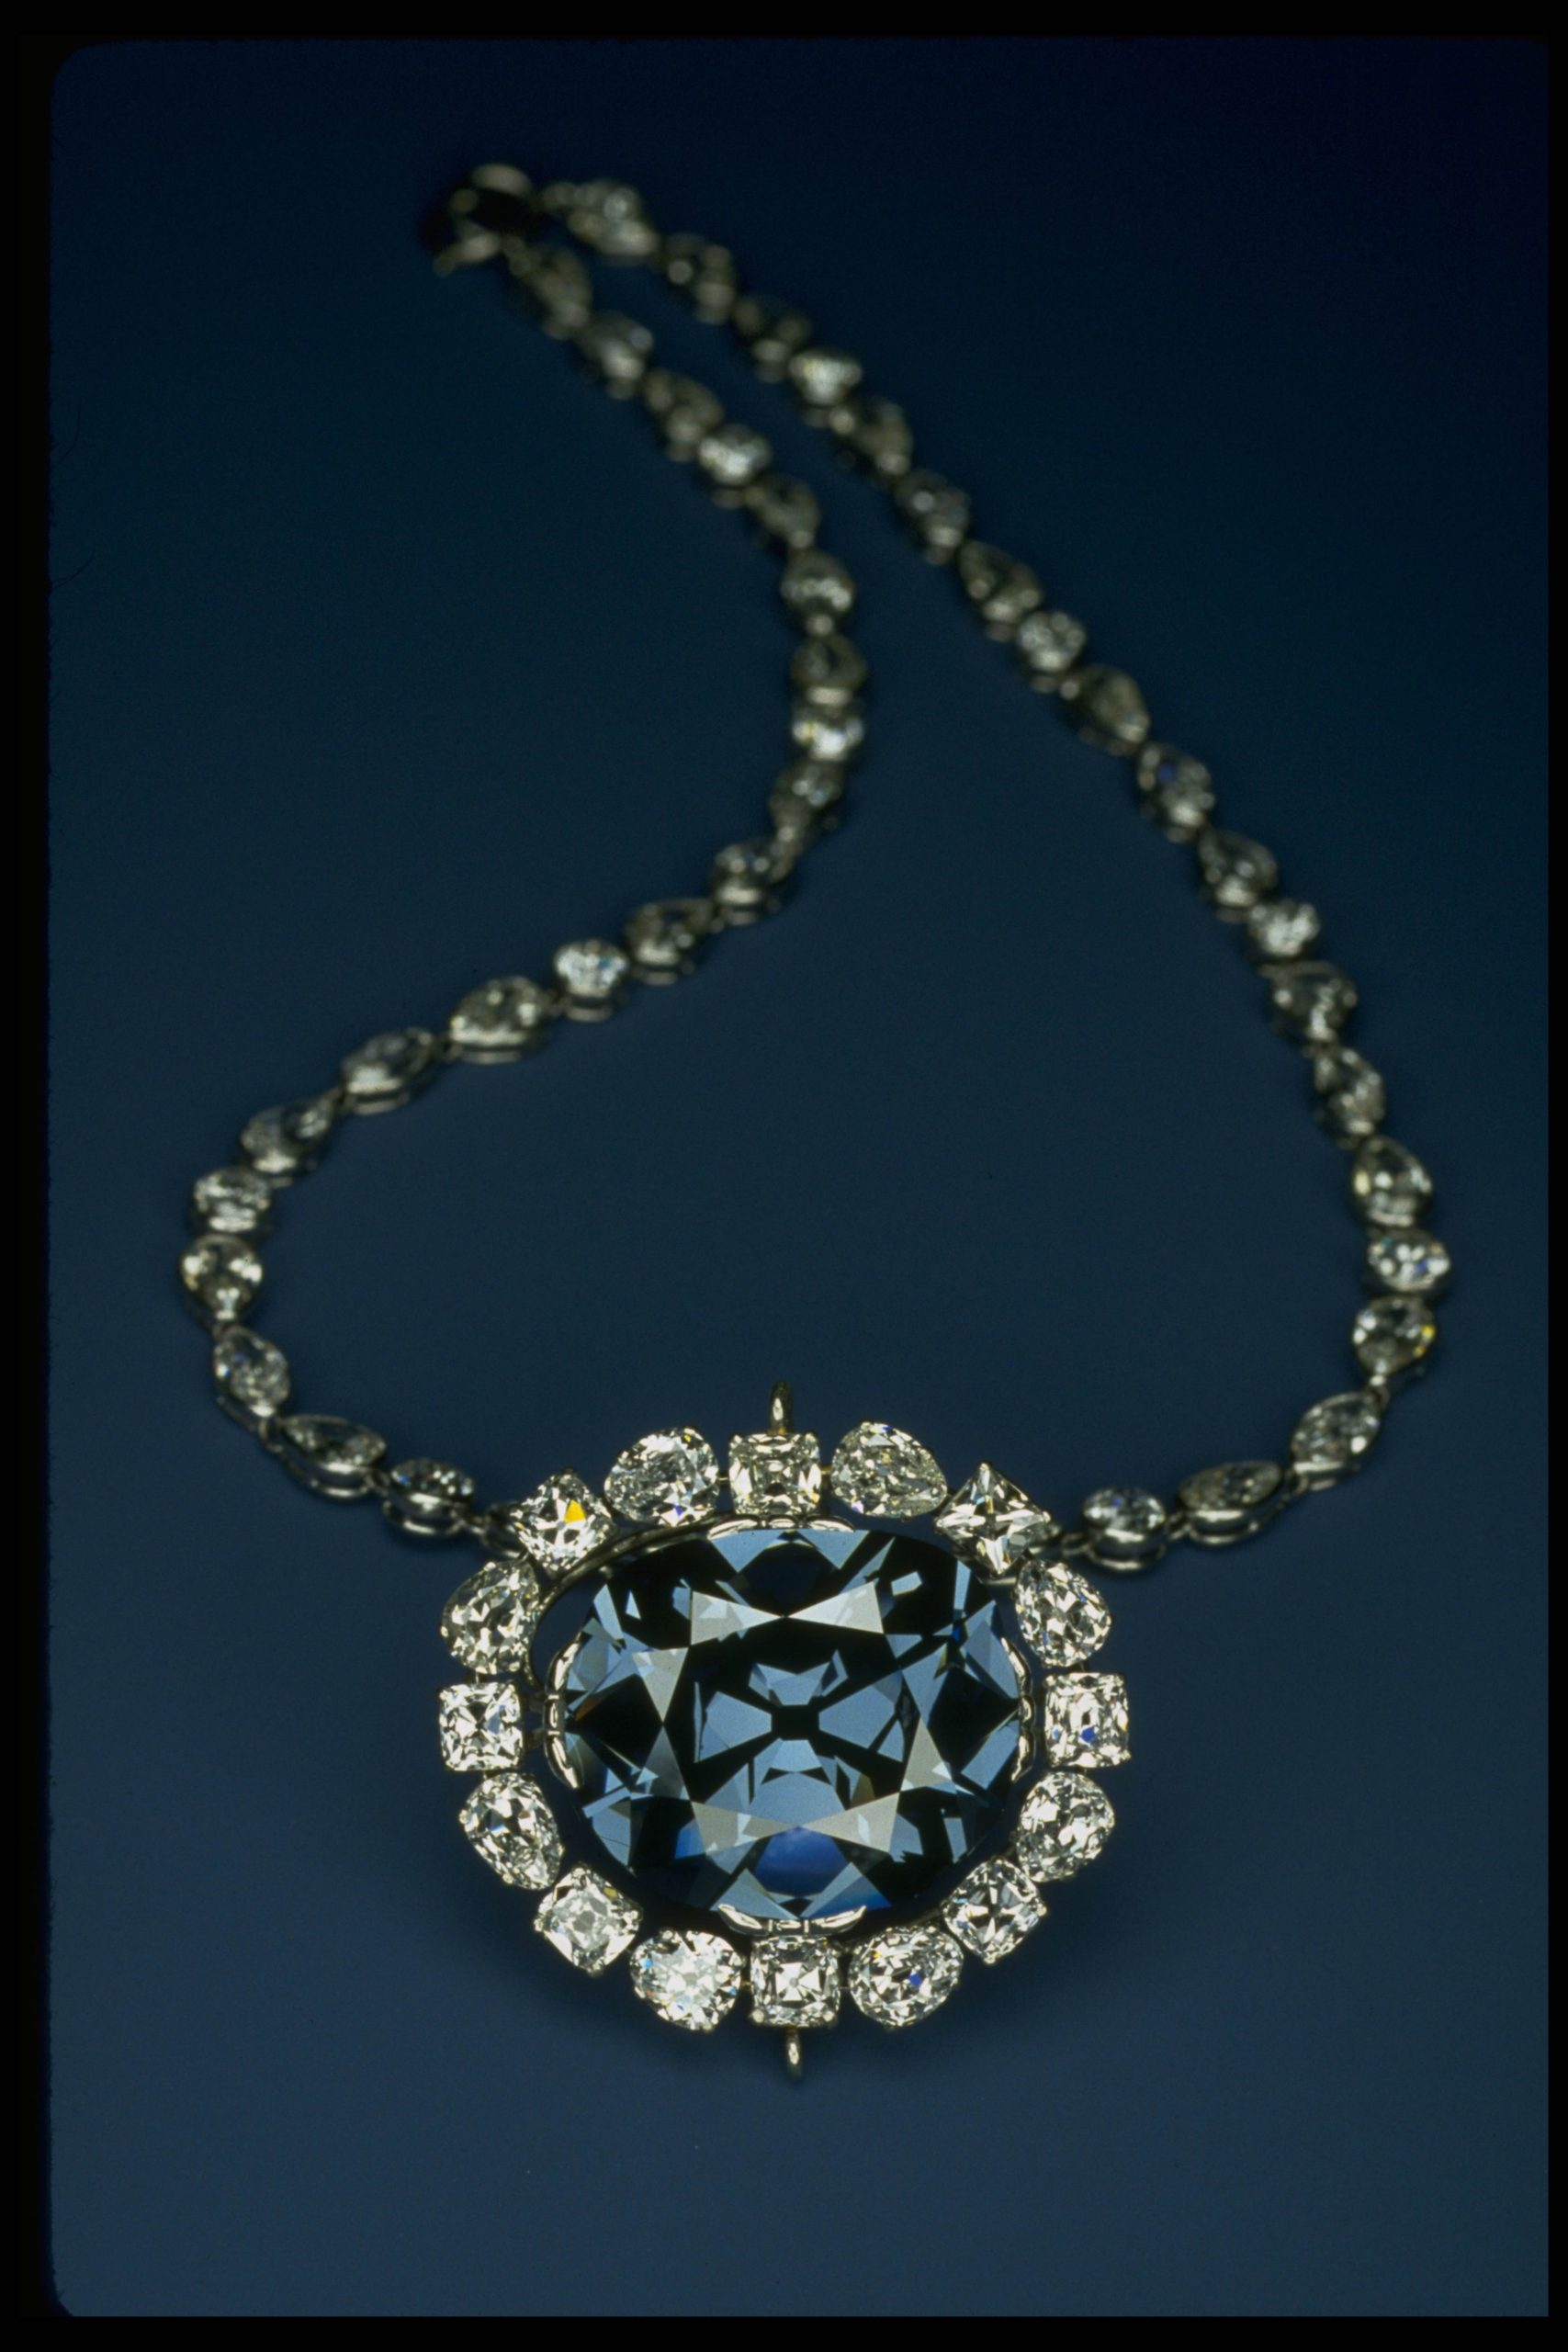 The Hope diamond necklace